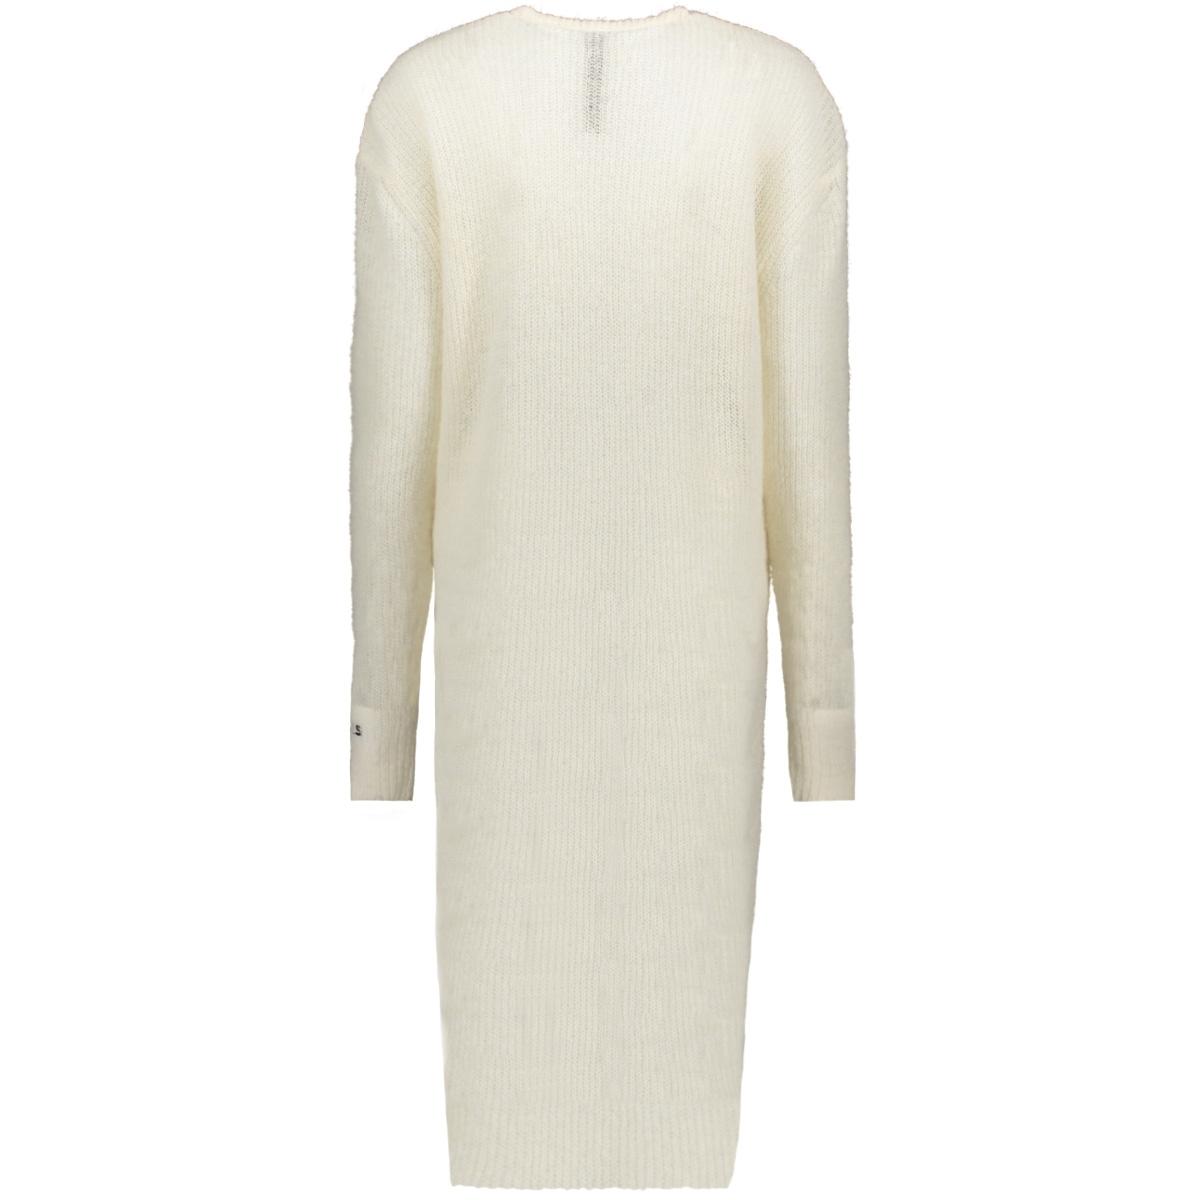 cardigan alpaca merino 20 661 9103 10 days vest soft white mellee